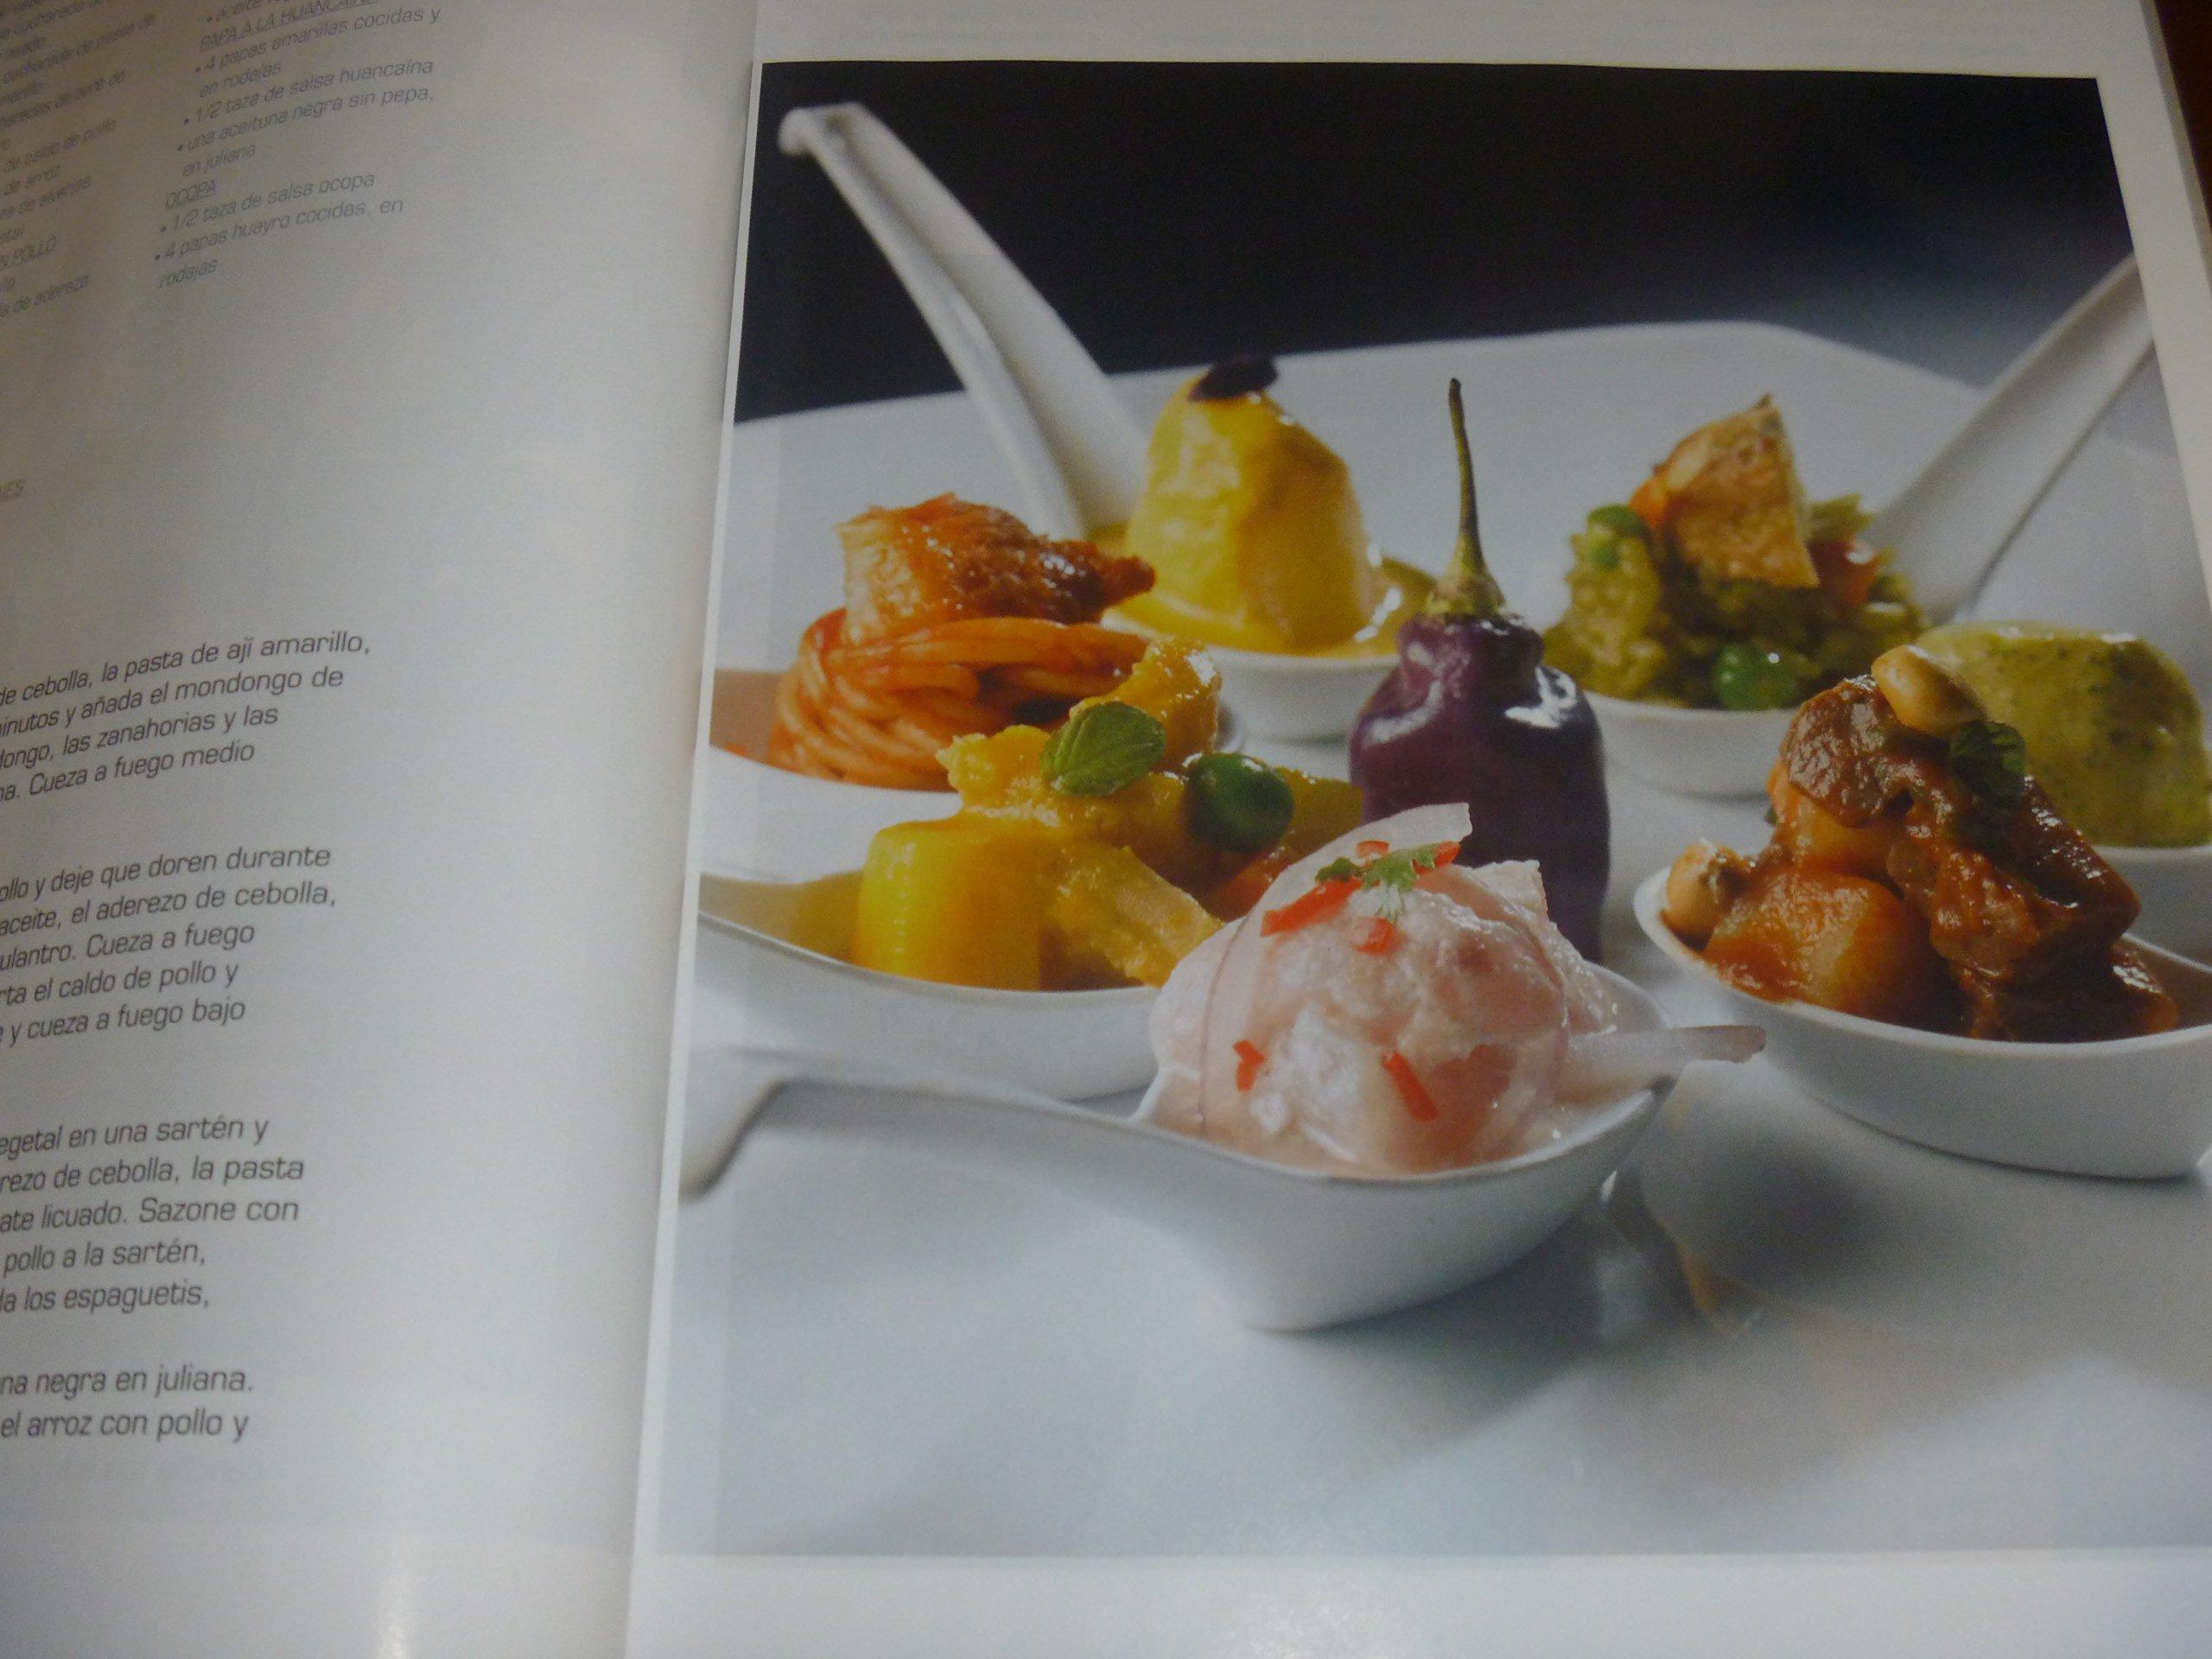 La Cocina De La Calle By Gaston Acurio: Gaston Acurio: 9789972217548: Amazon.com: Books